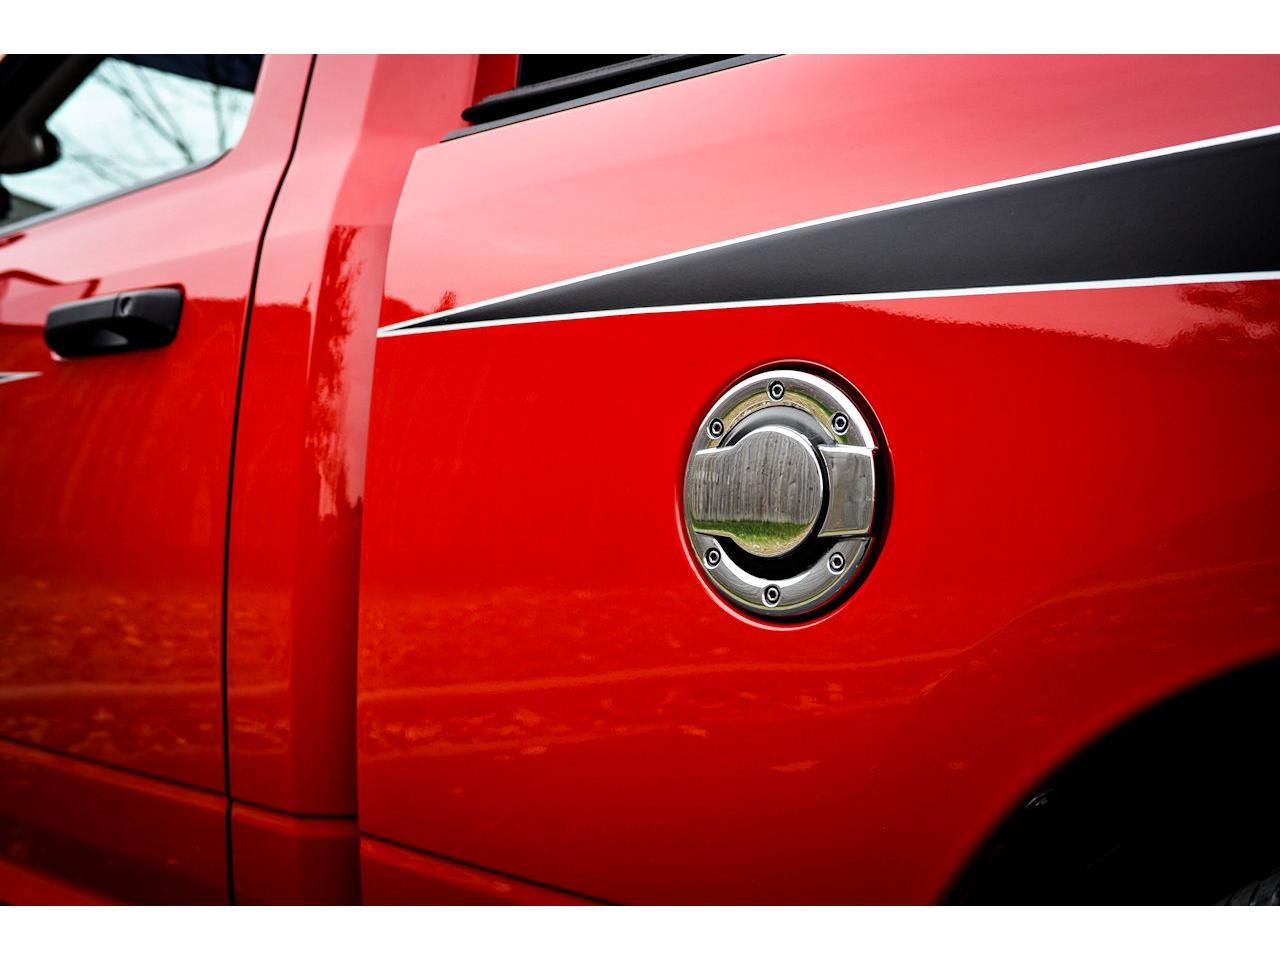 2011 Dodge Ram (CC-1227550) for sale in O'Fallon, Illinois